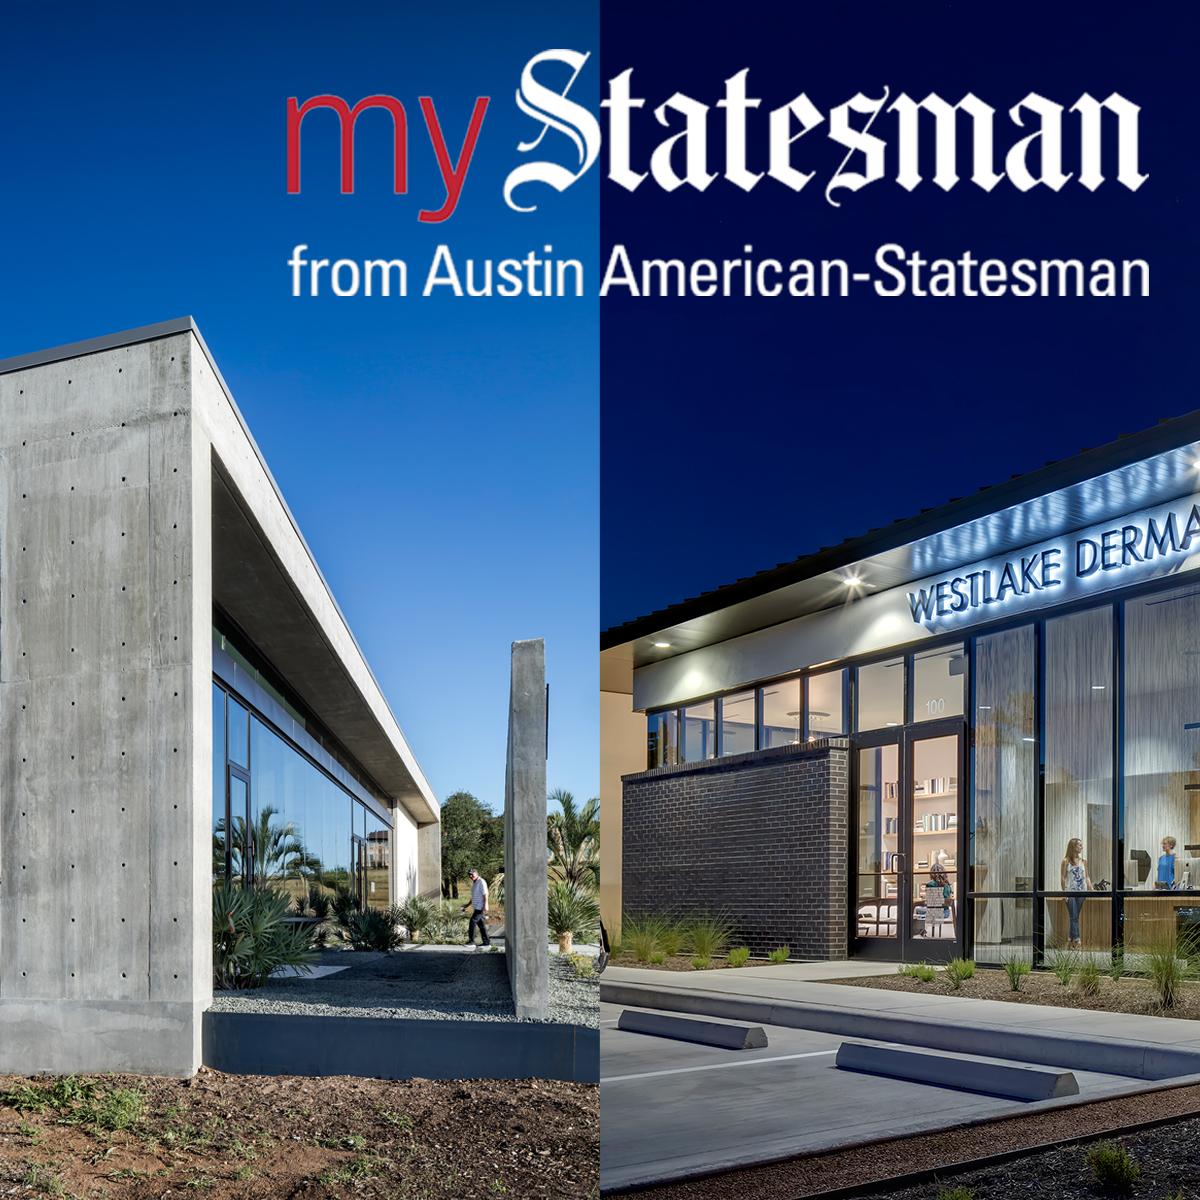 Statesman_2018_0530_WD.jpg